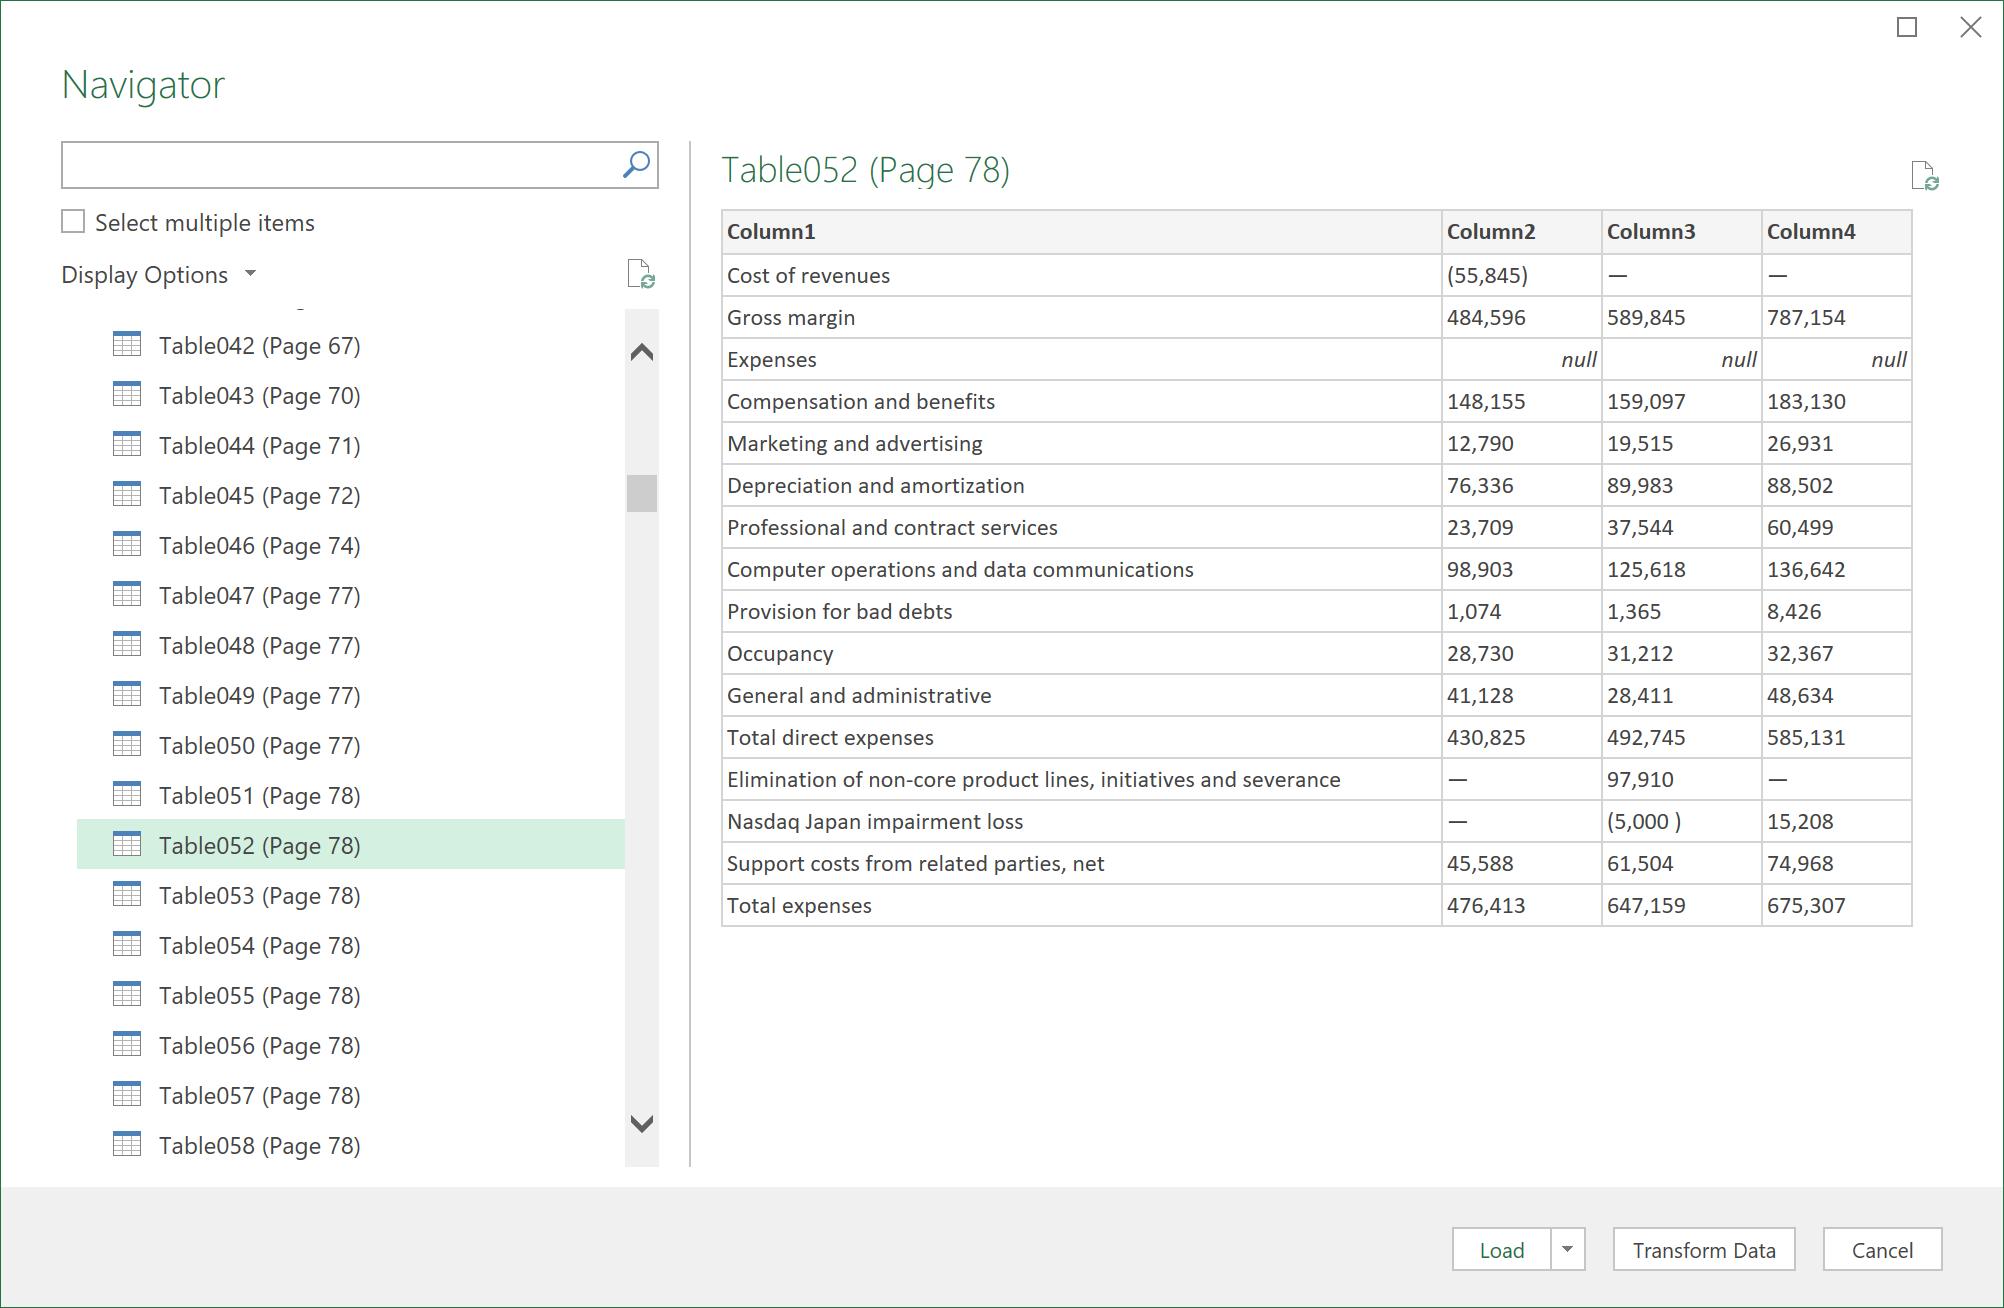 The Navigator dialog box for importing PDF data